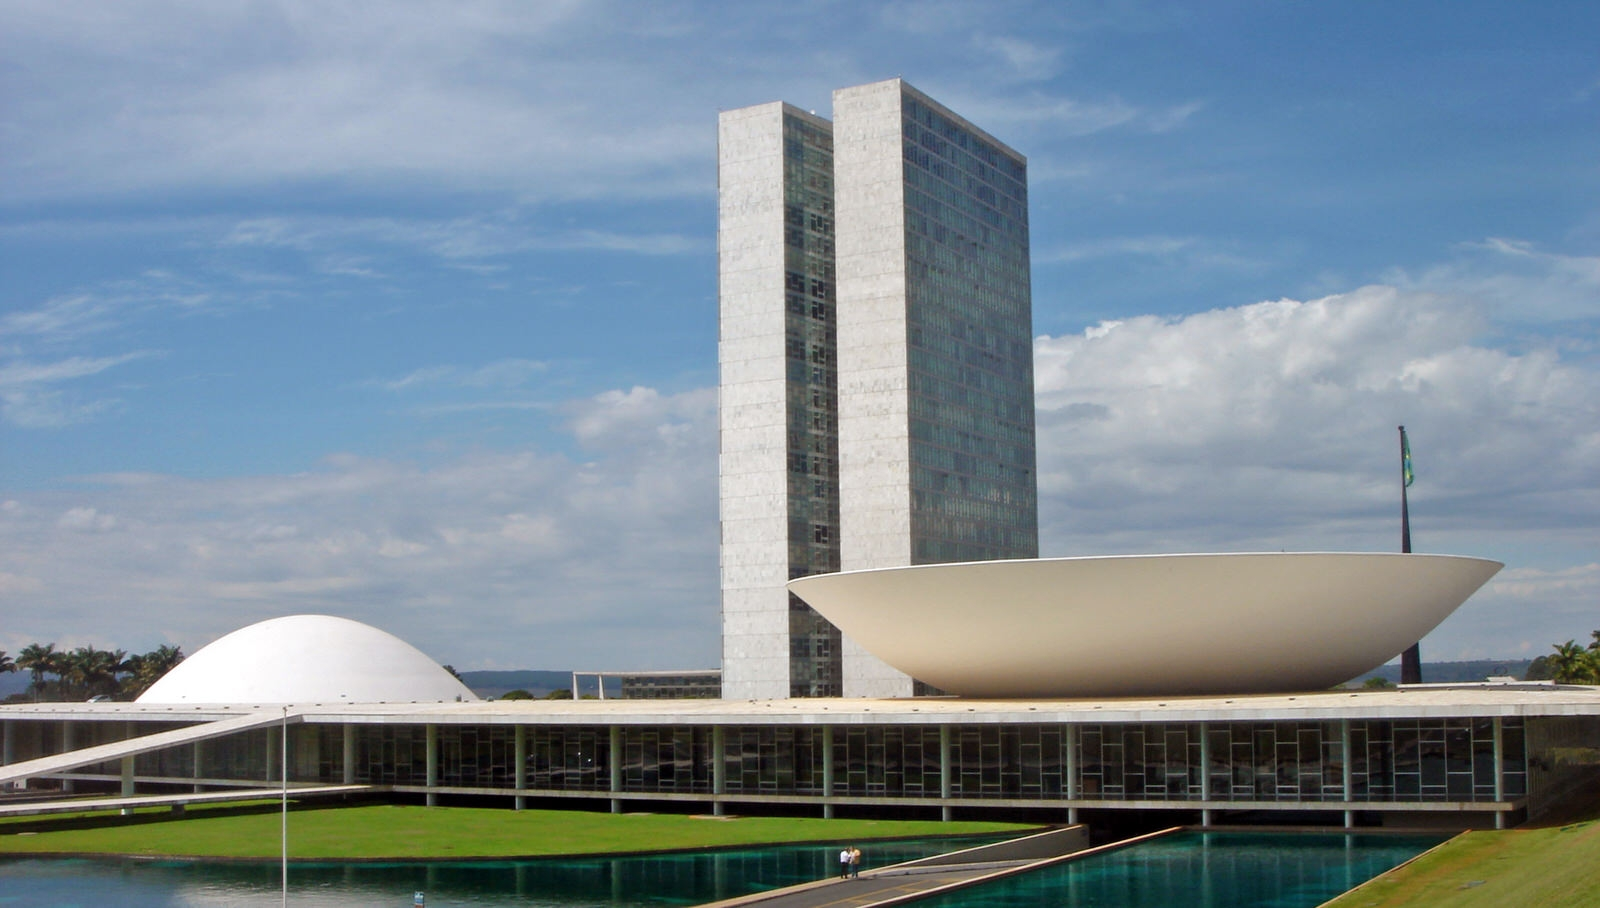 03 OscarNiemeyer Congreso Nacional de Brasilia 1600x908 c